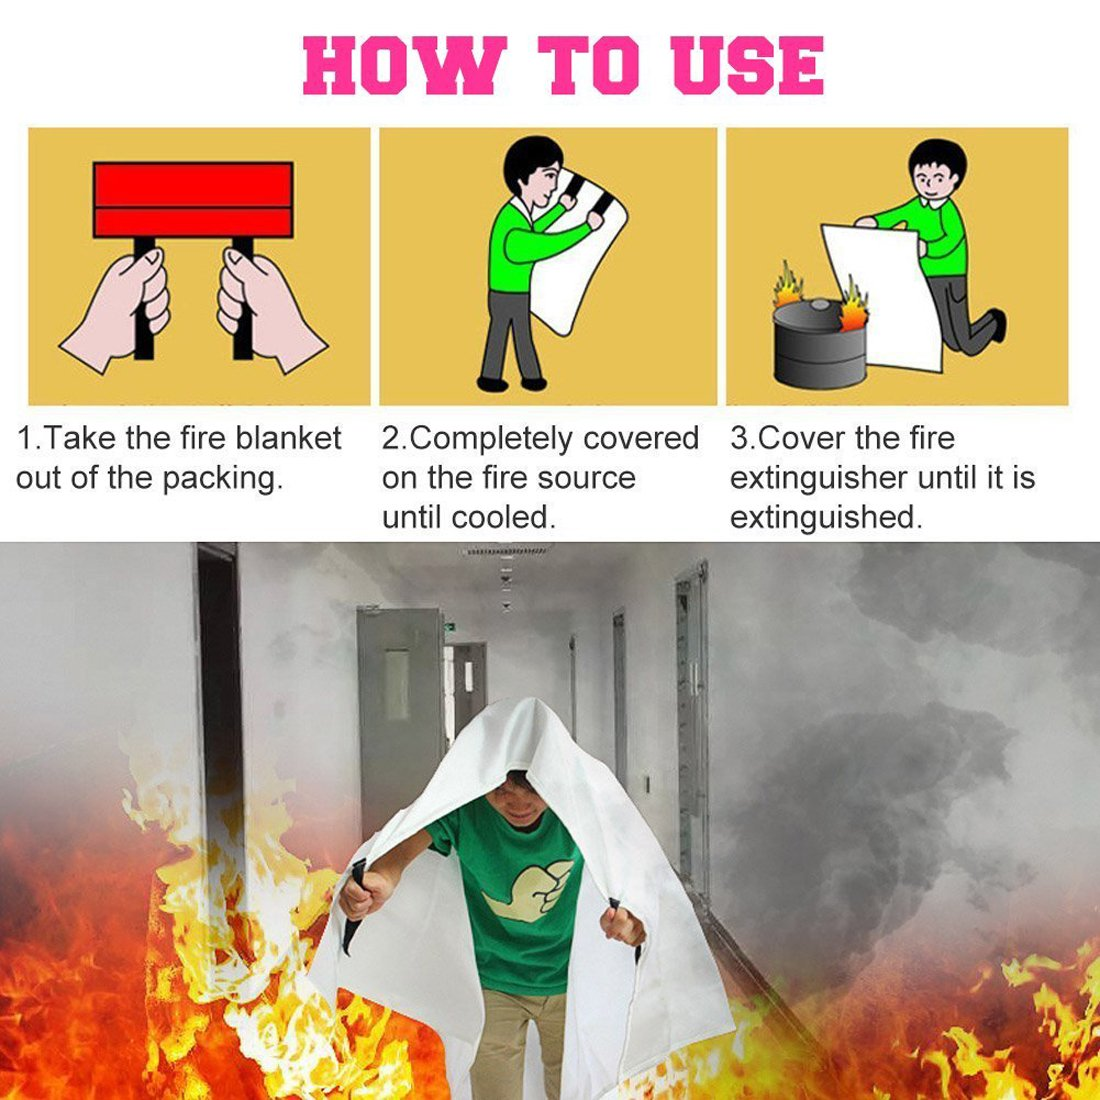 autom/óvil Camping Chimenea 1.2x1.8m Parrilla Lonnsaffe Mantas ign/ífugas Manta ignifuga Manta de Emergencia contra Incendios Manta de Supervivencia Cubierta de Seguridad Ideal para Cocina